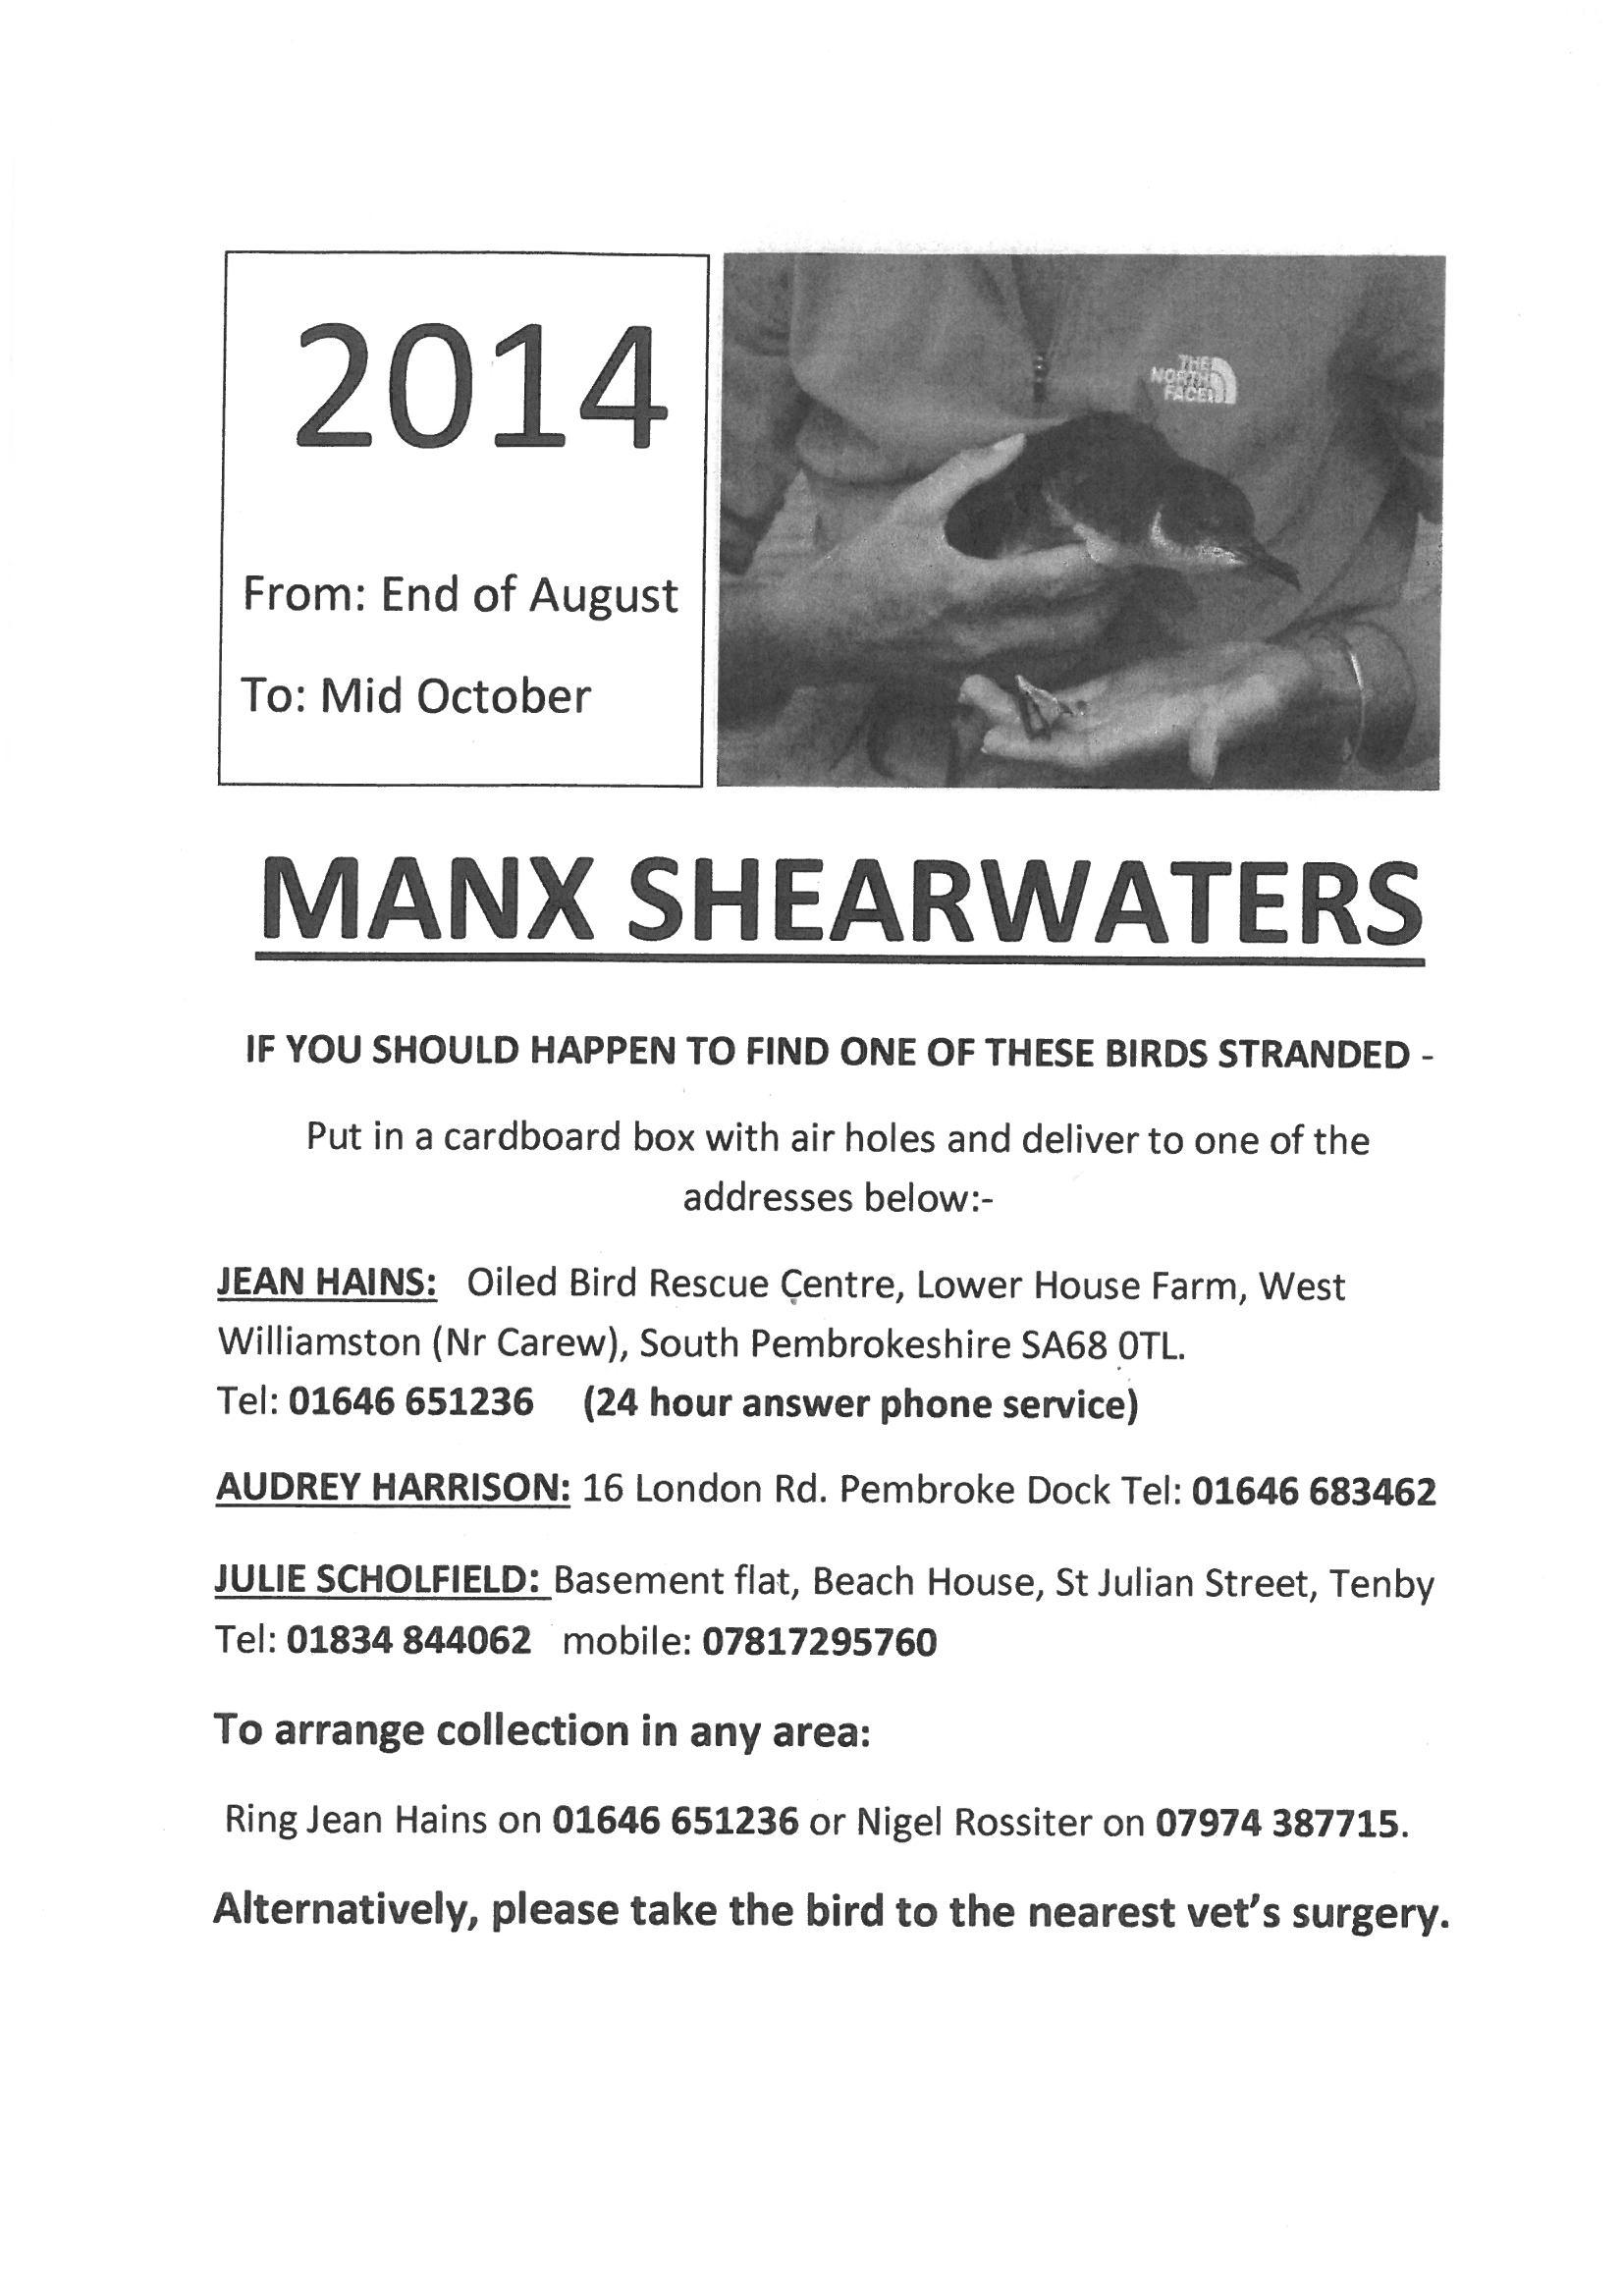 Manx Shearwater 2014